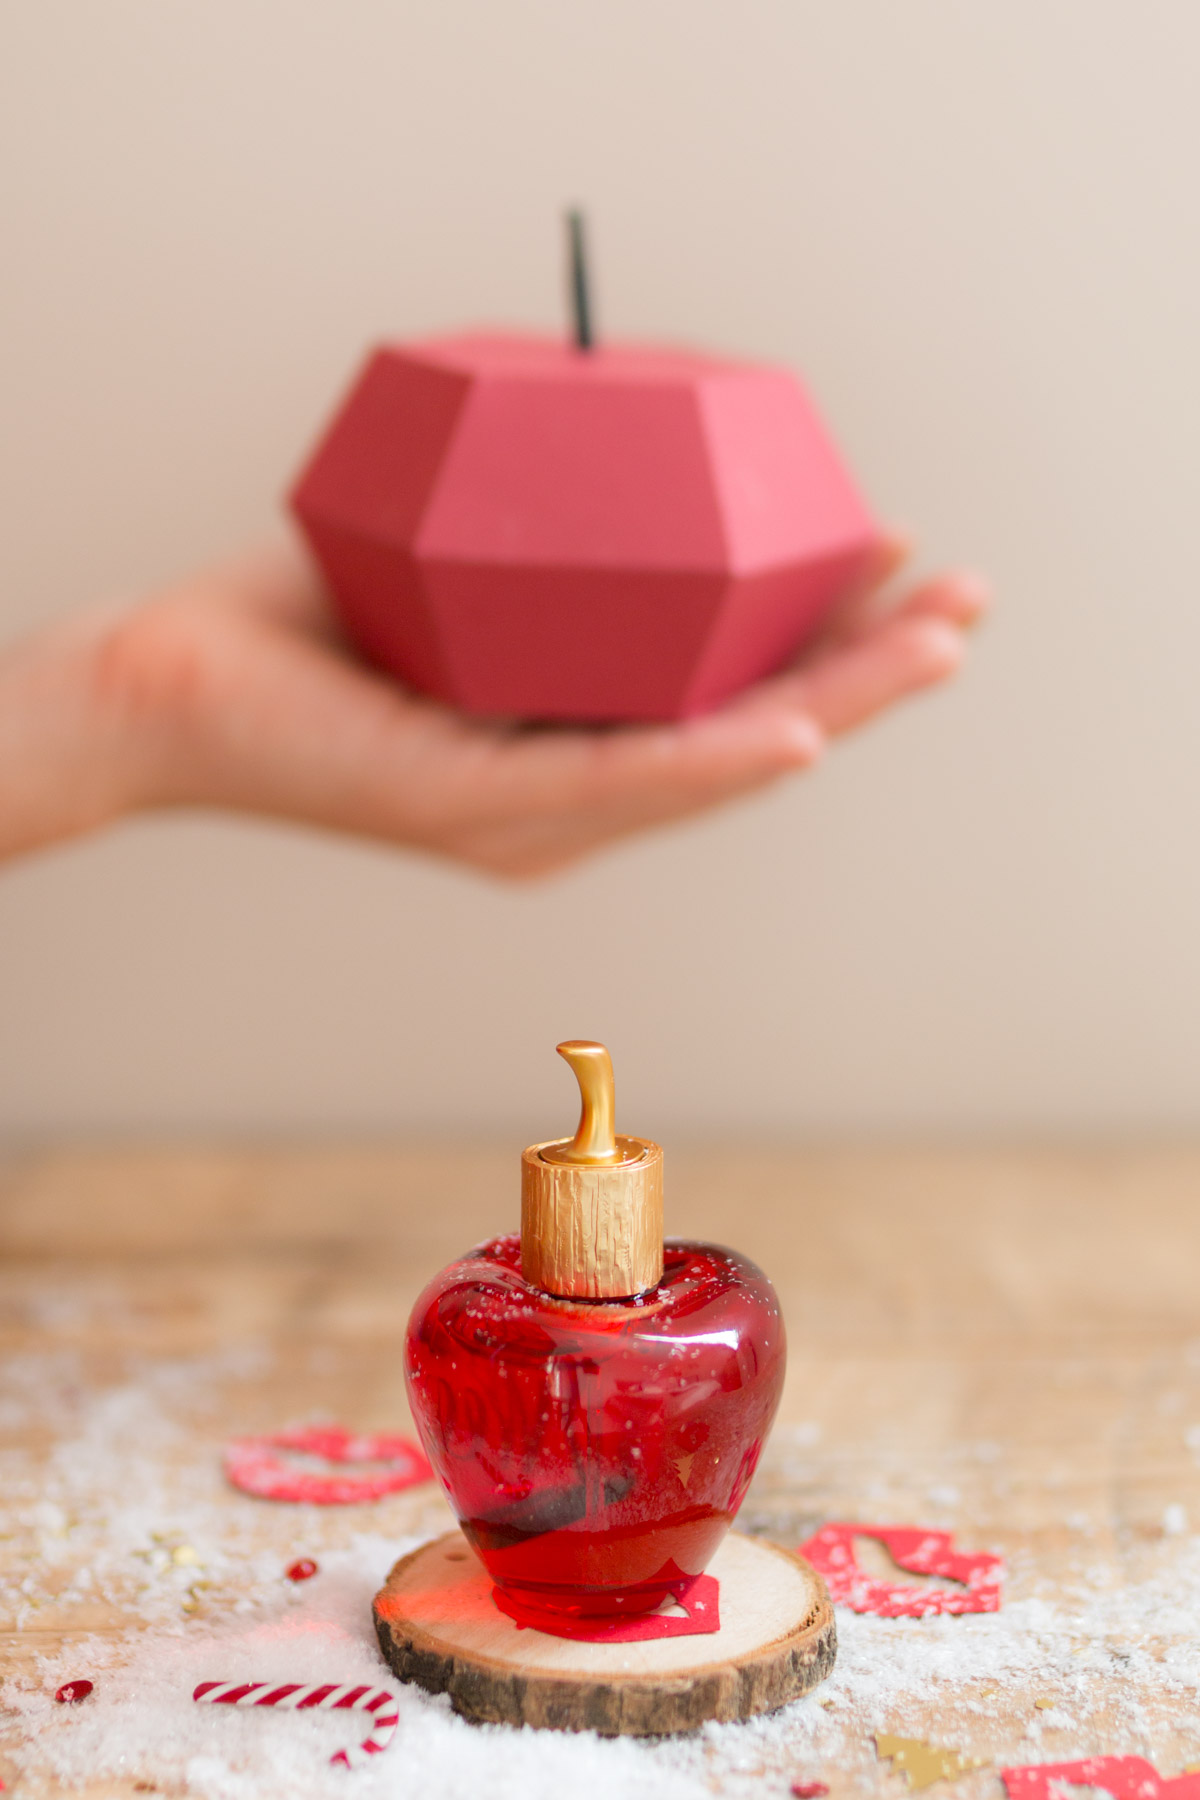 Lolita lempicka DIY boite pomme  I Sp4nkblog-11